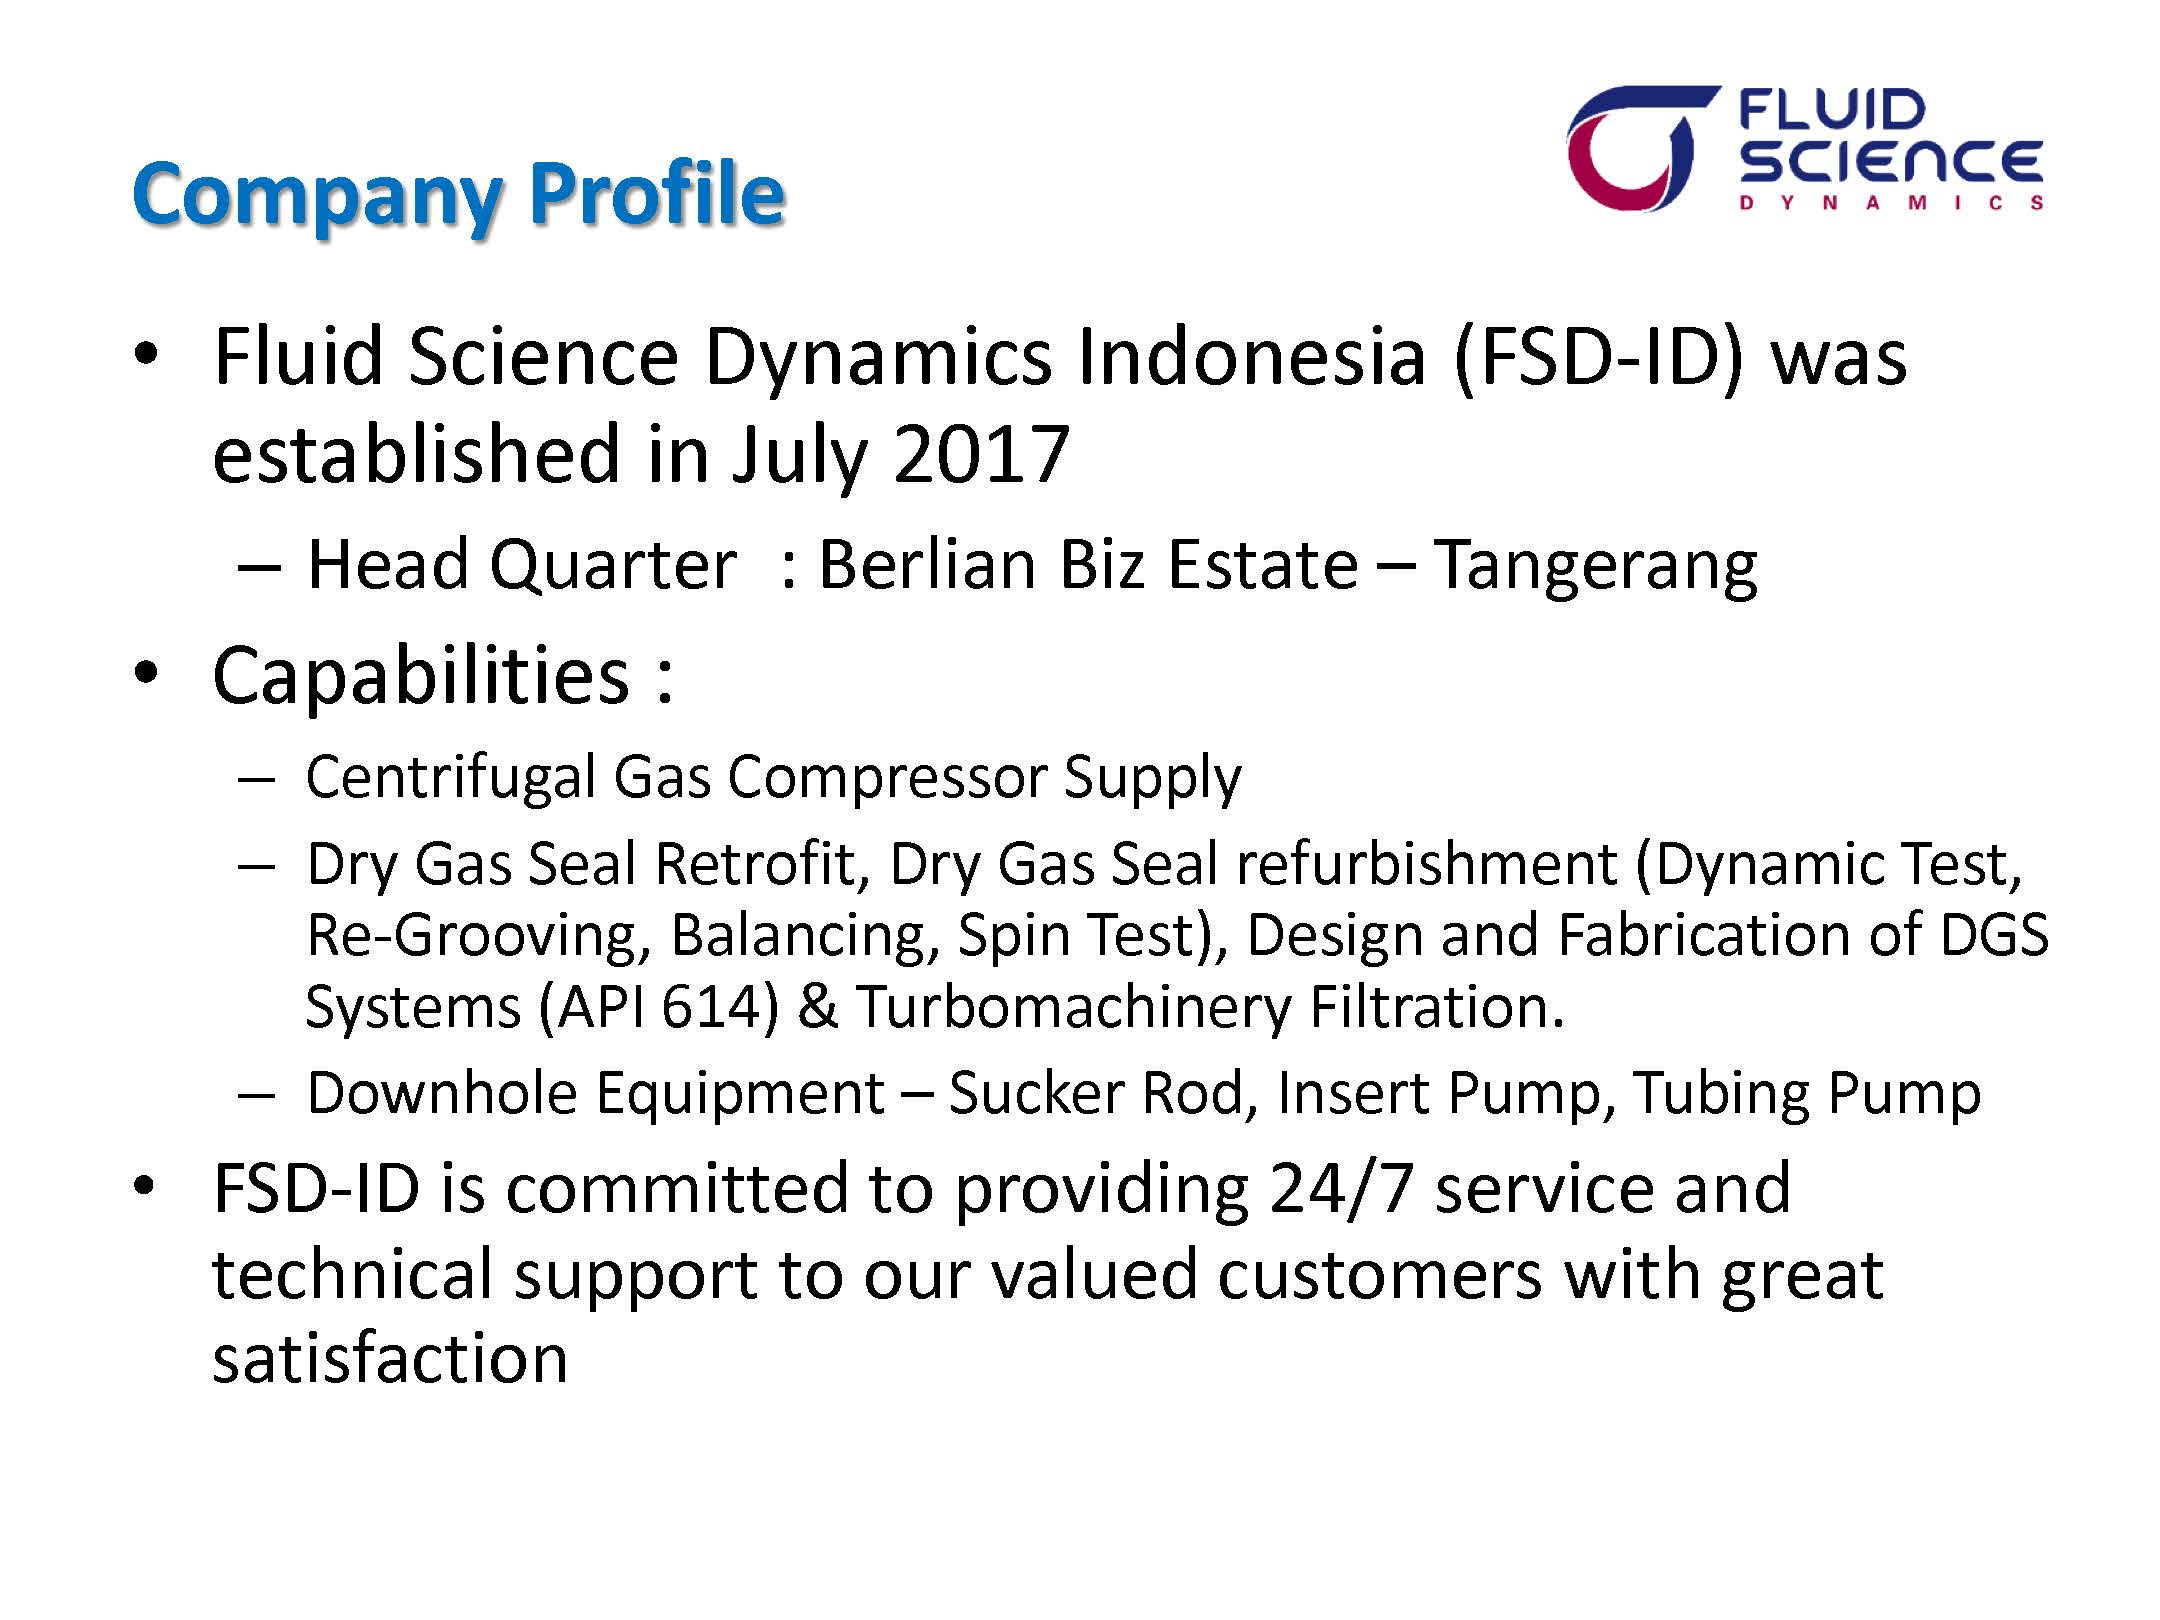 FSD Indonesia Company Profile-R9_Page_02.jpg